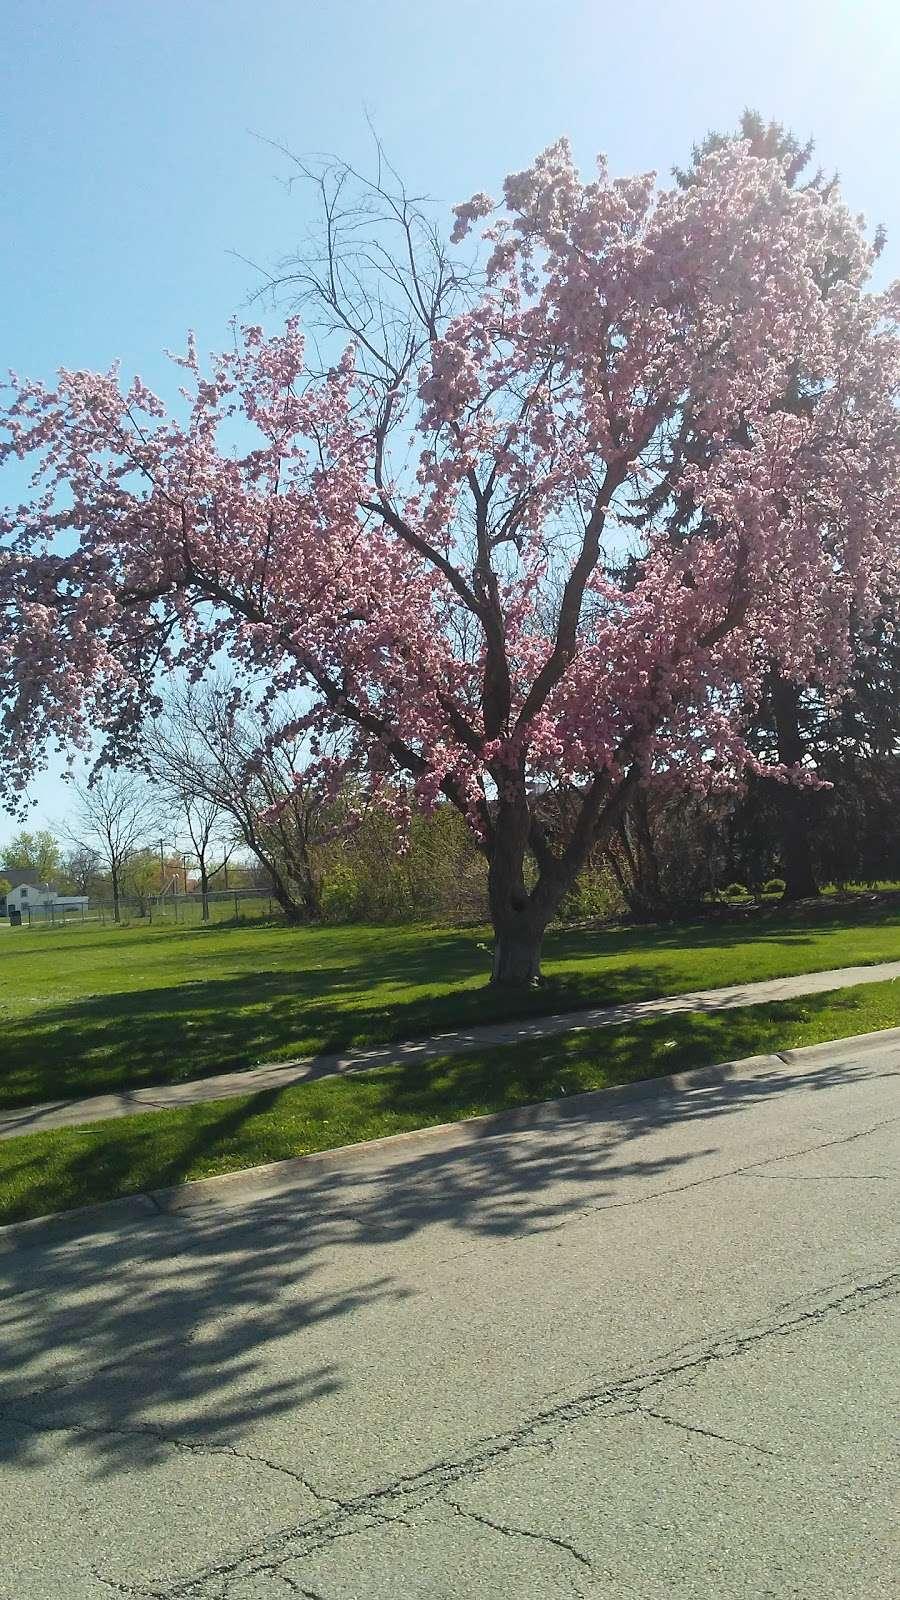 Chino Park - park  | Photo 6 of 10 | Address: 630 Illinois Blvd, Hoffman Estates, IL 60169, USA | Phone: (847) 885-7500